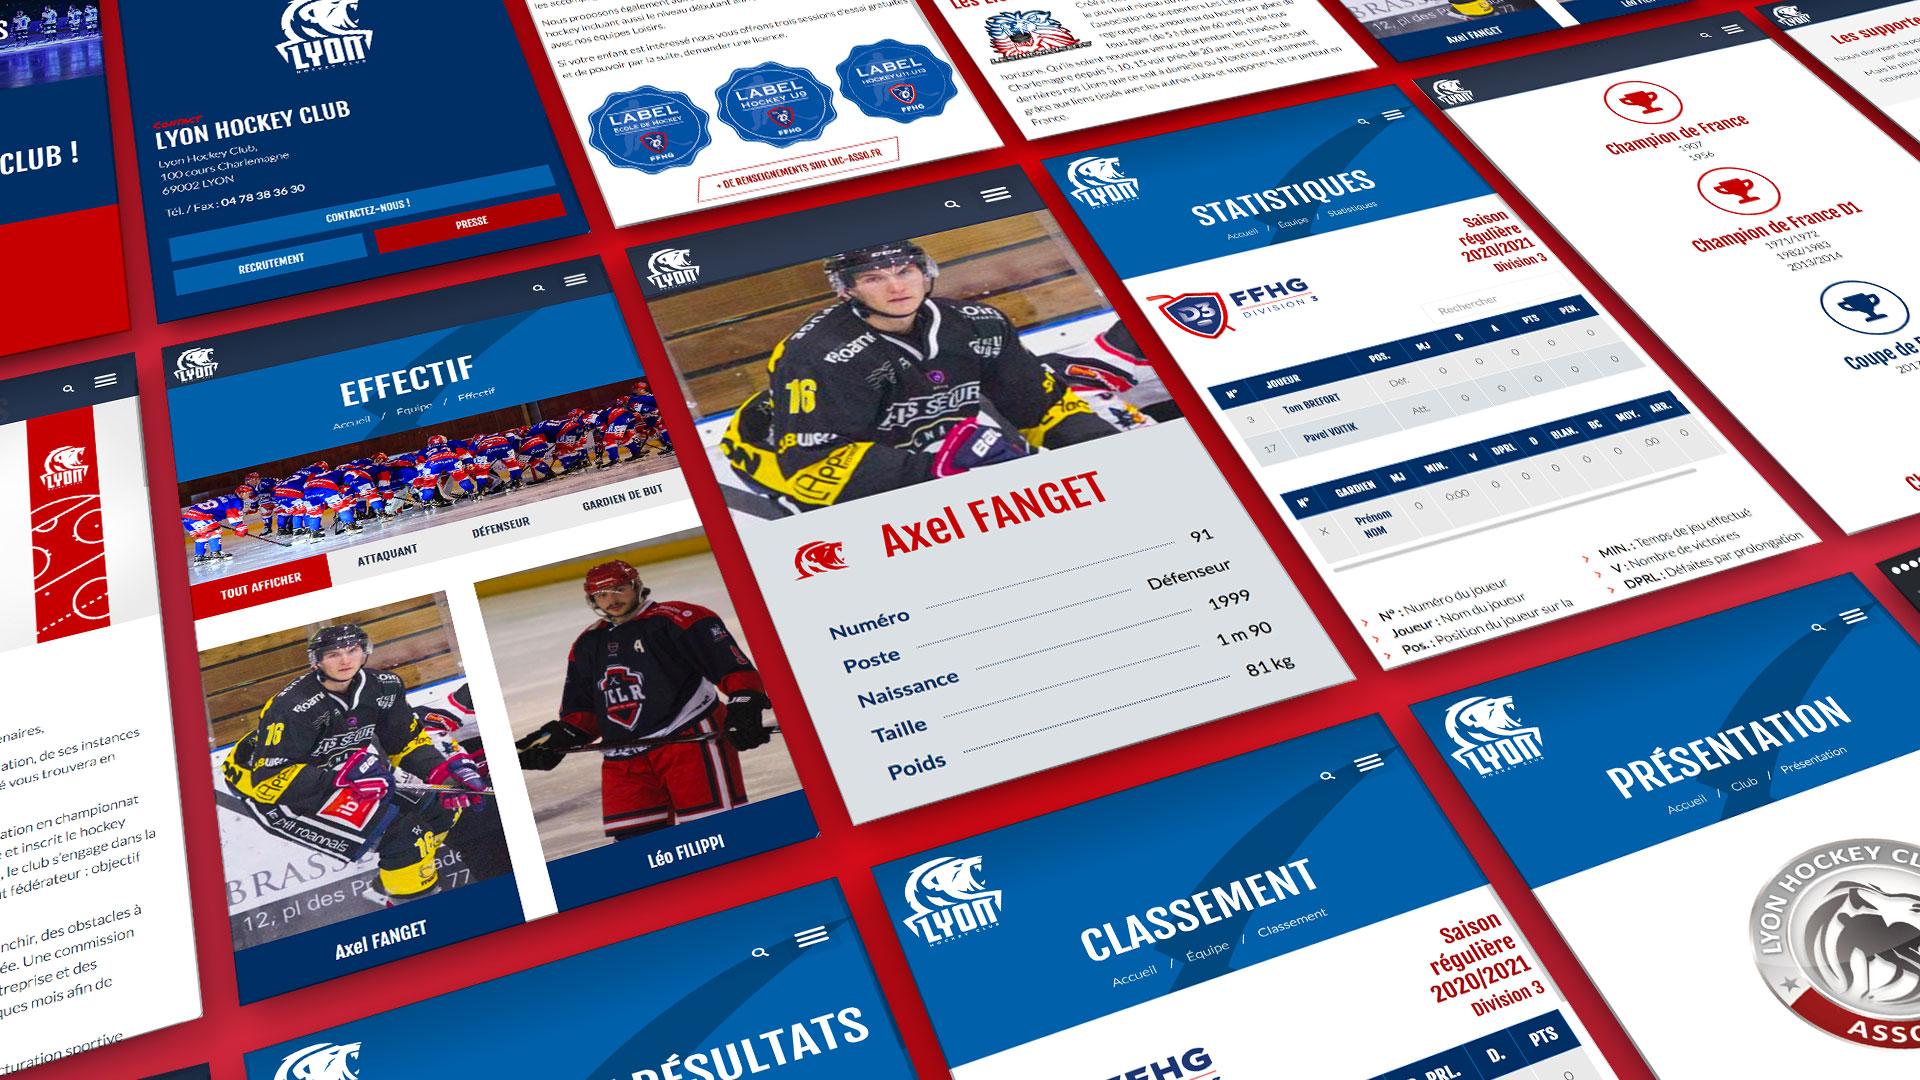 Lhc site mobile